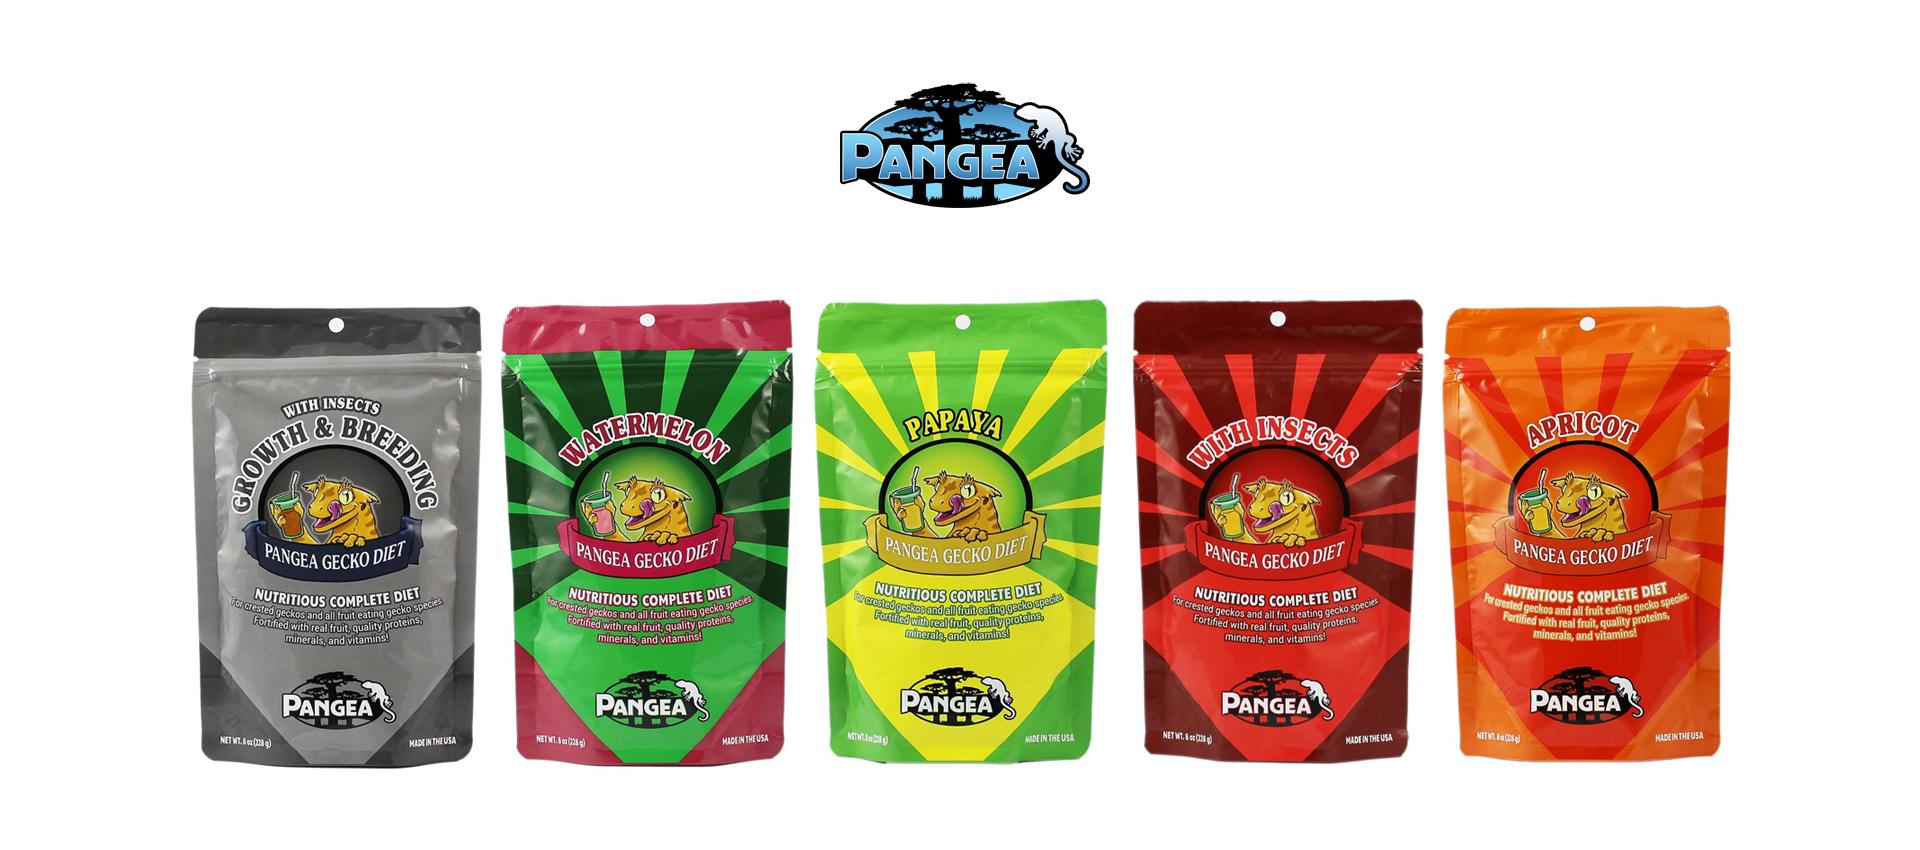 https://www.crestedgeckodiet.de/pangea-reptile